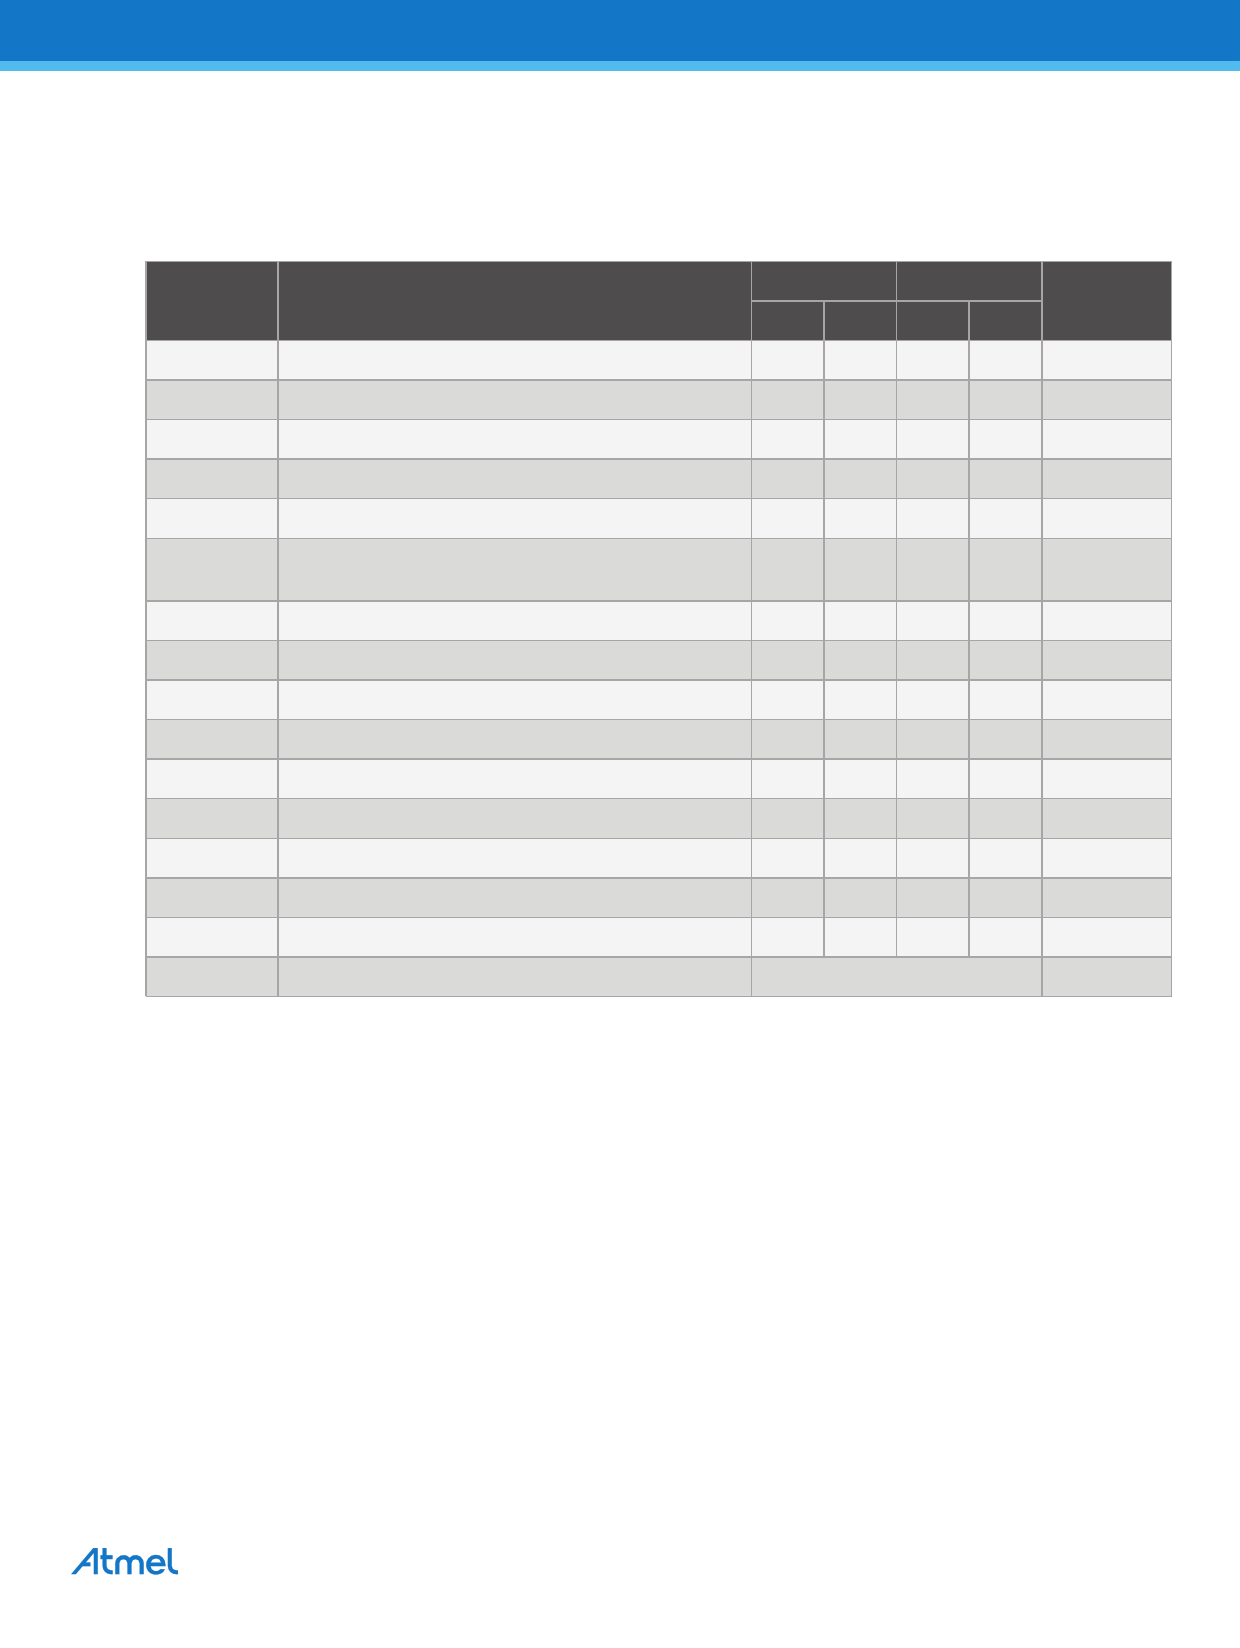 AT24C128C pdf